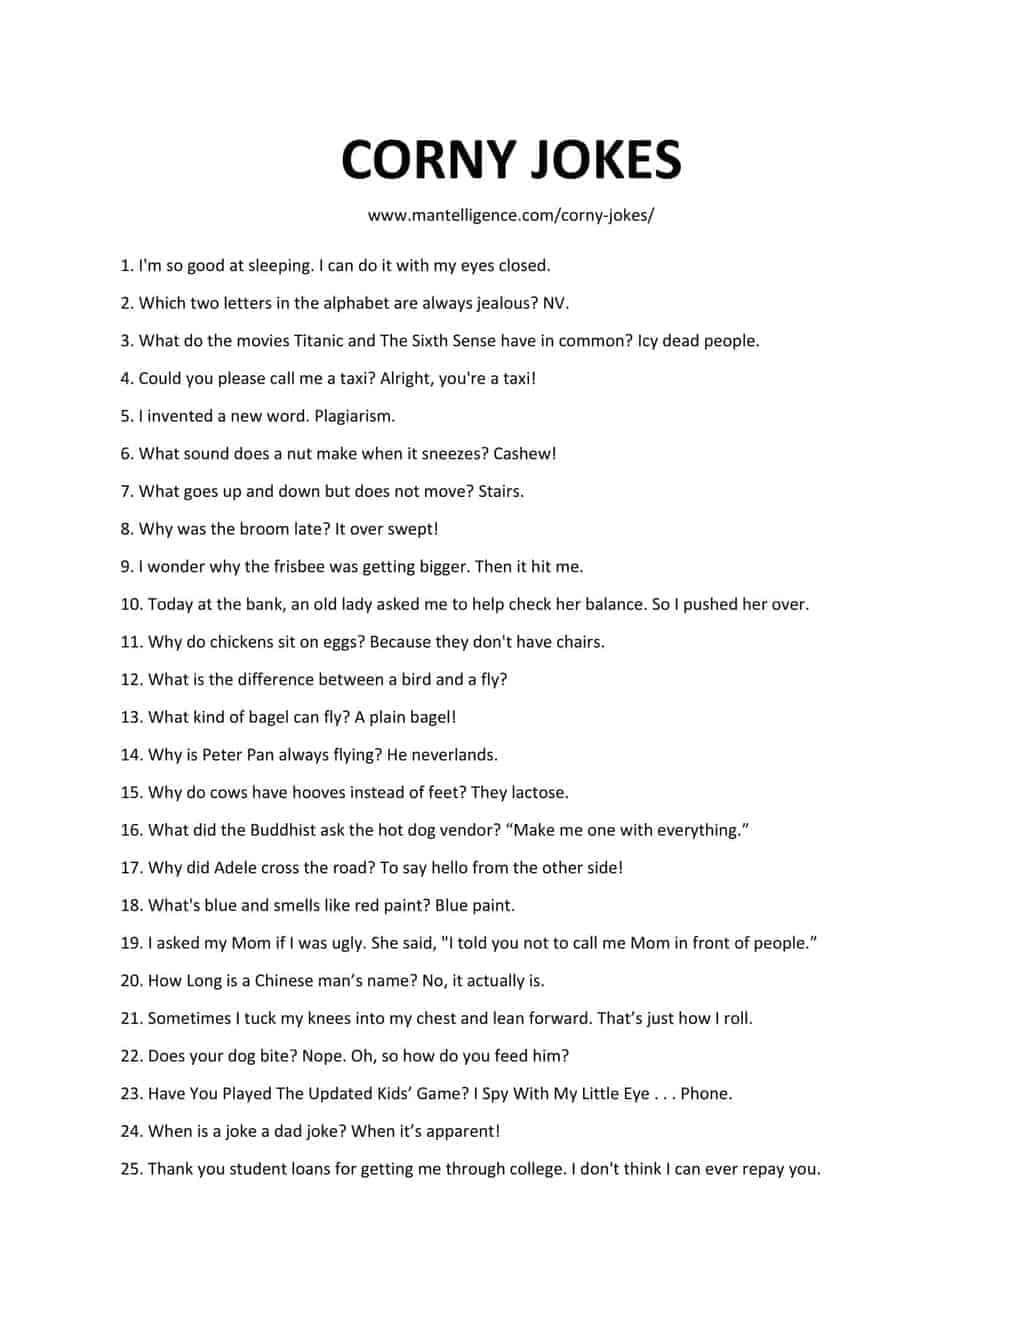 list of CORNY JOKES 3